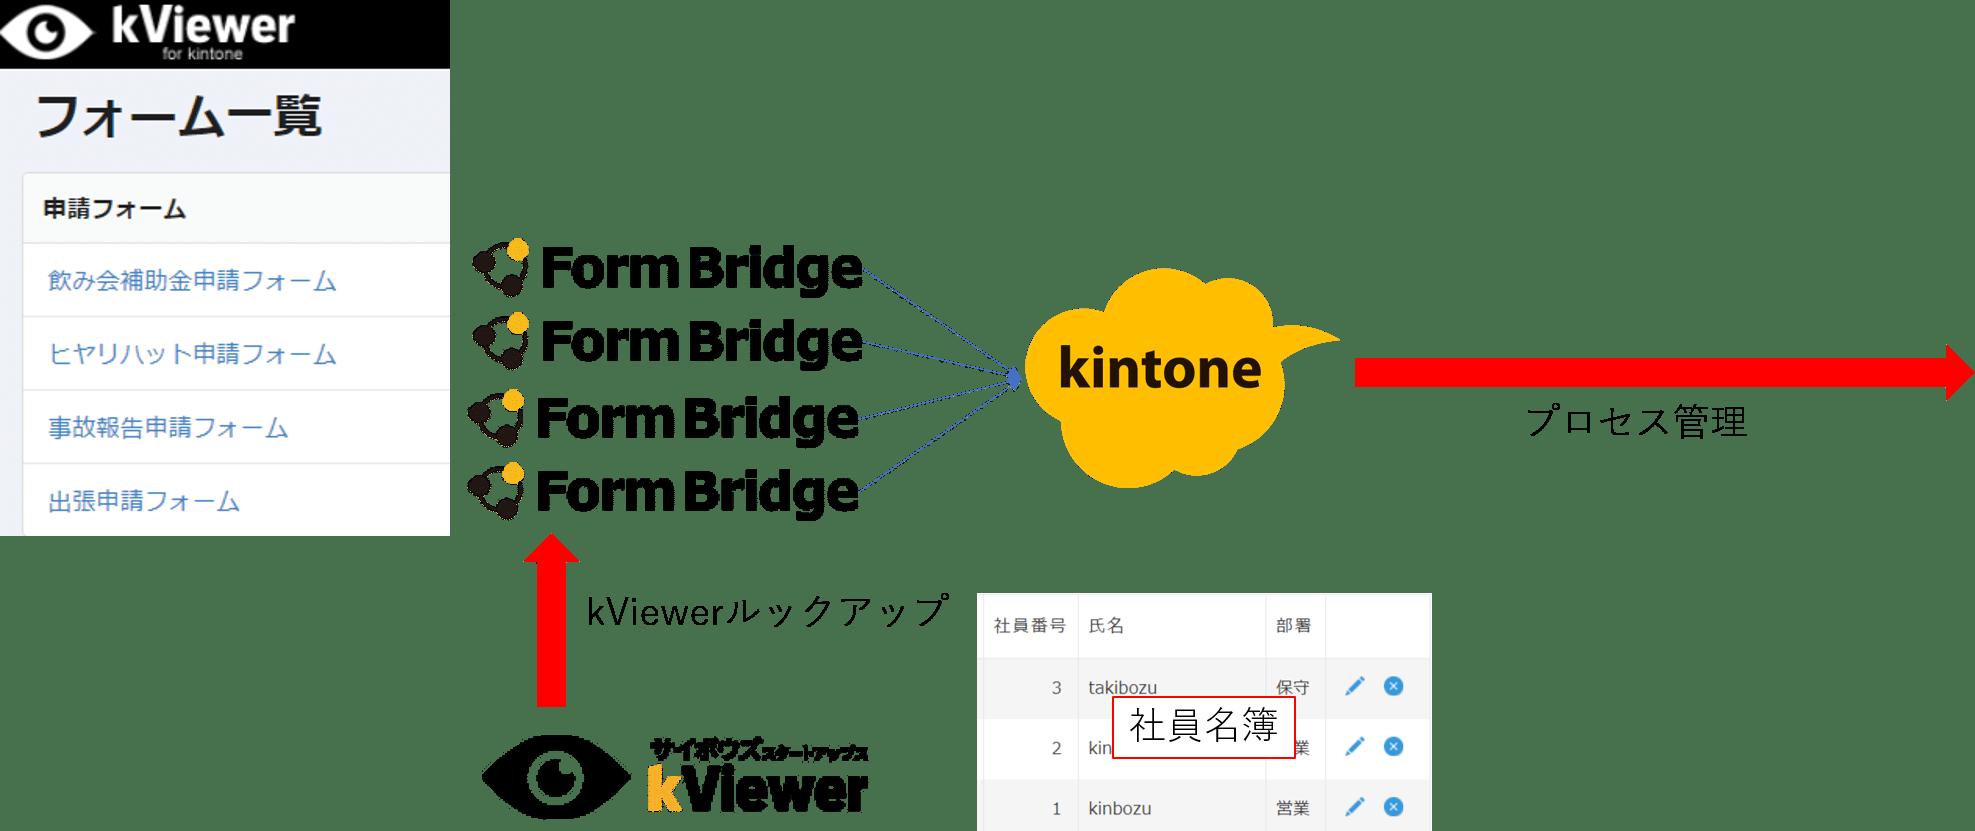 kintoneユーザー以外の活用方法例